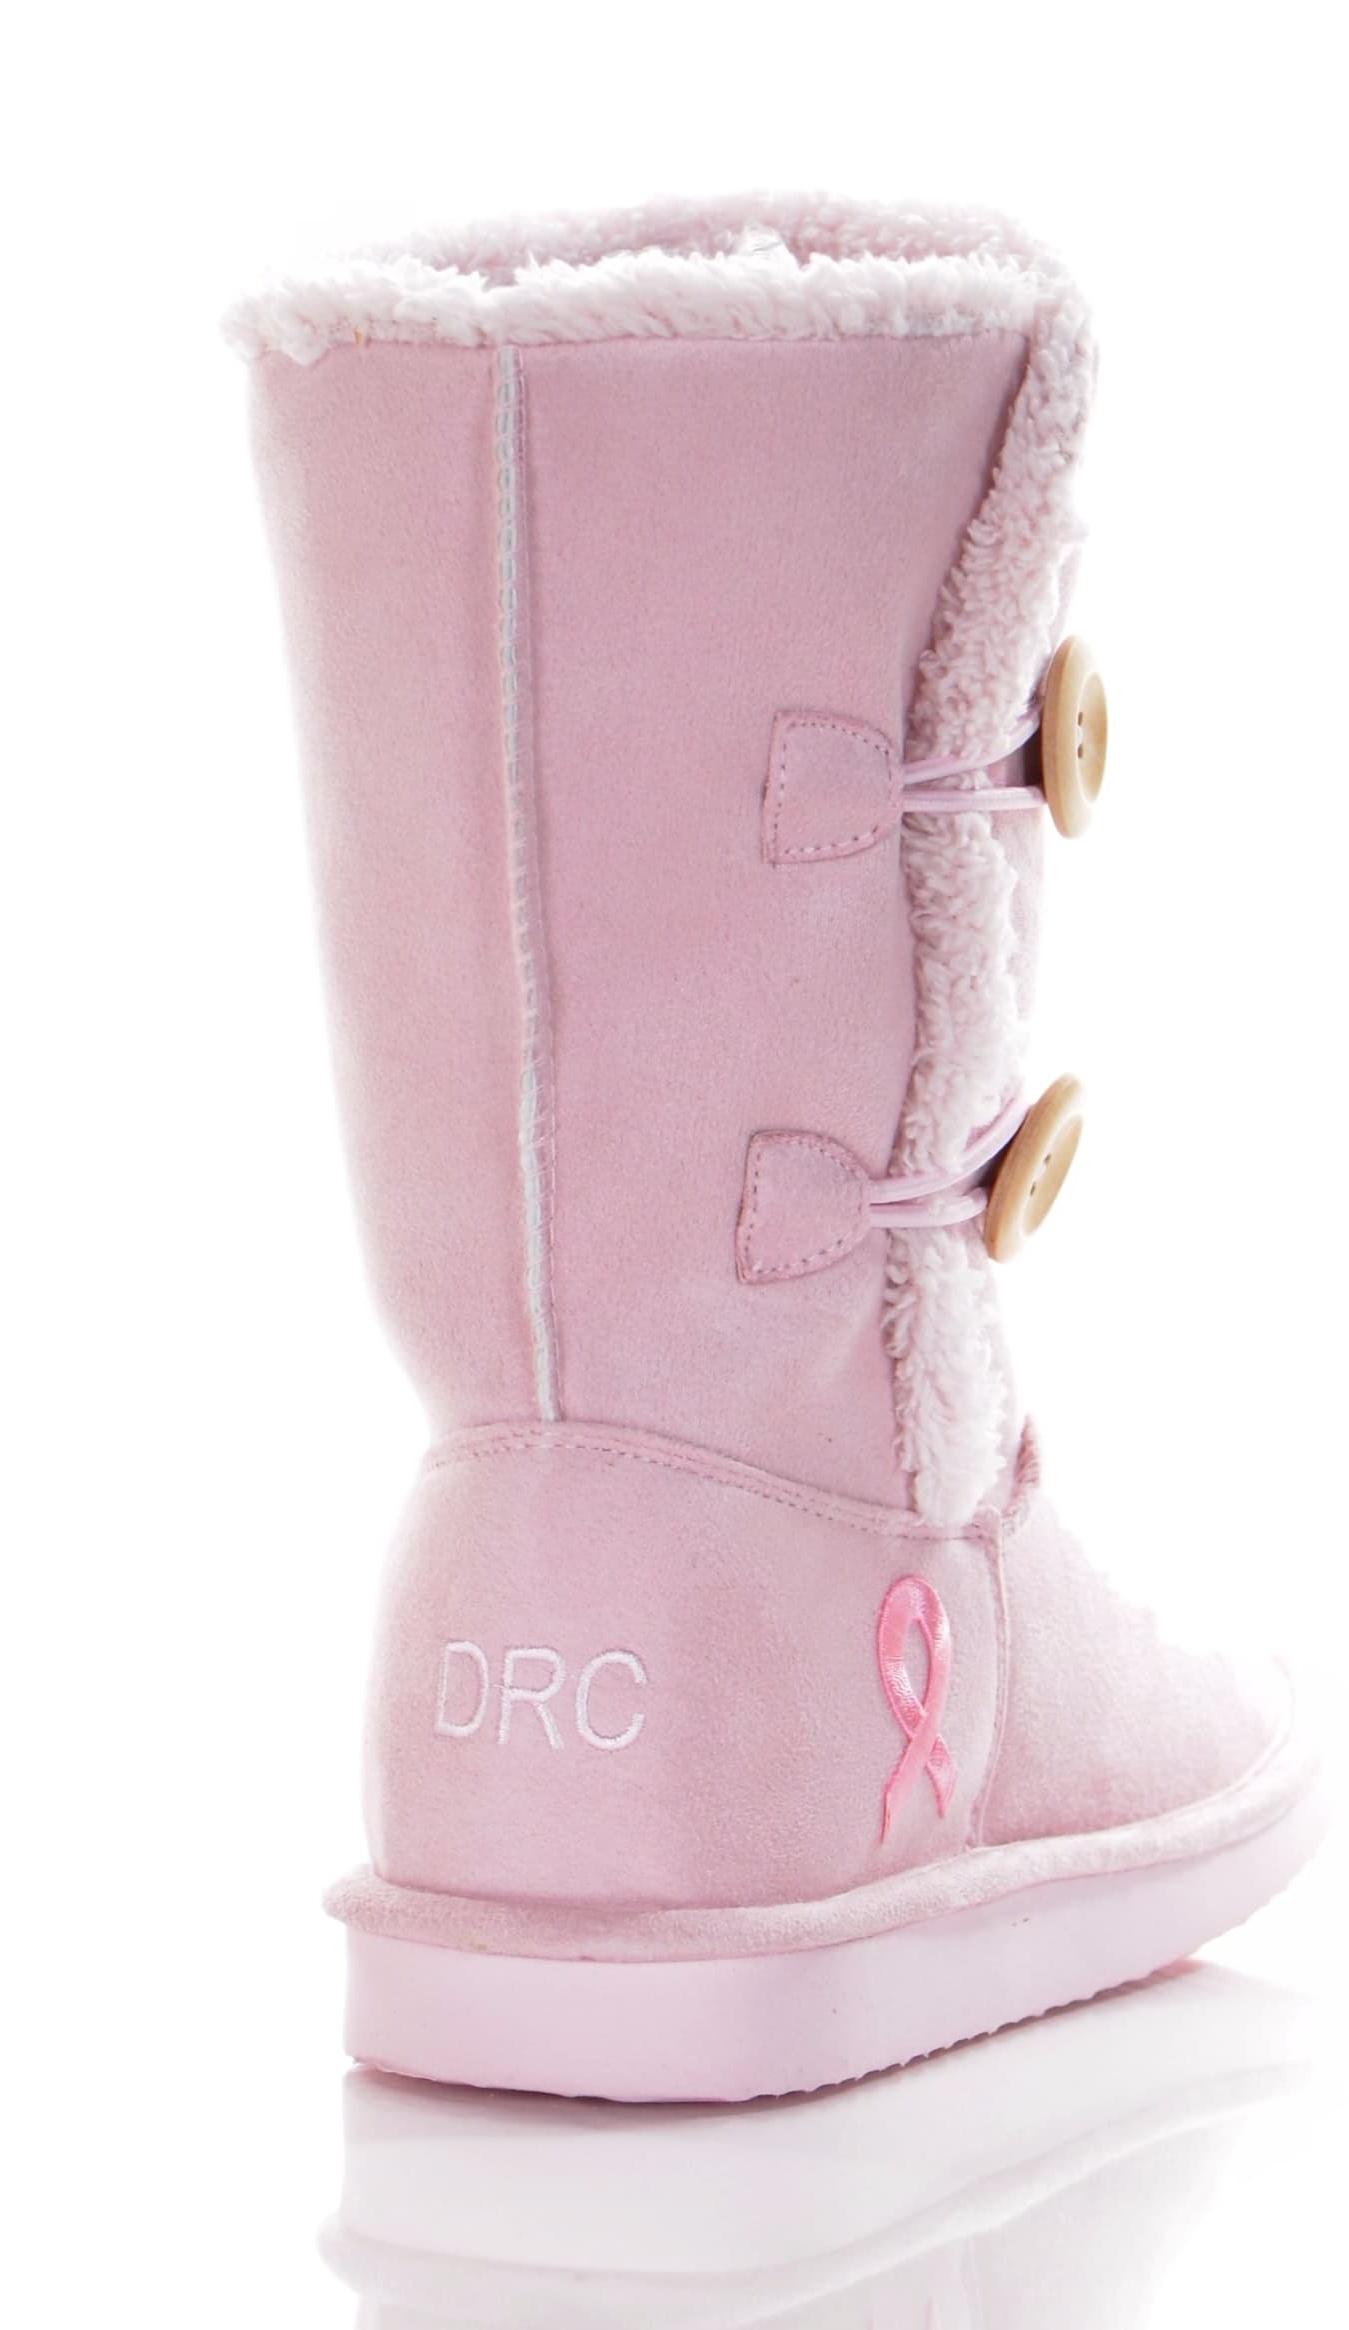 Dr. Comfort Tonya Women's Slipper Boot Pink